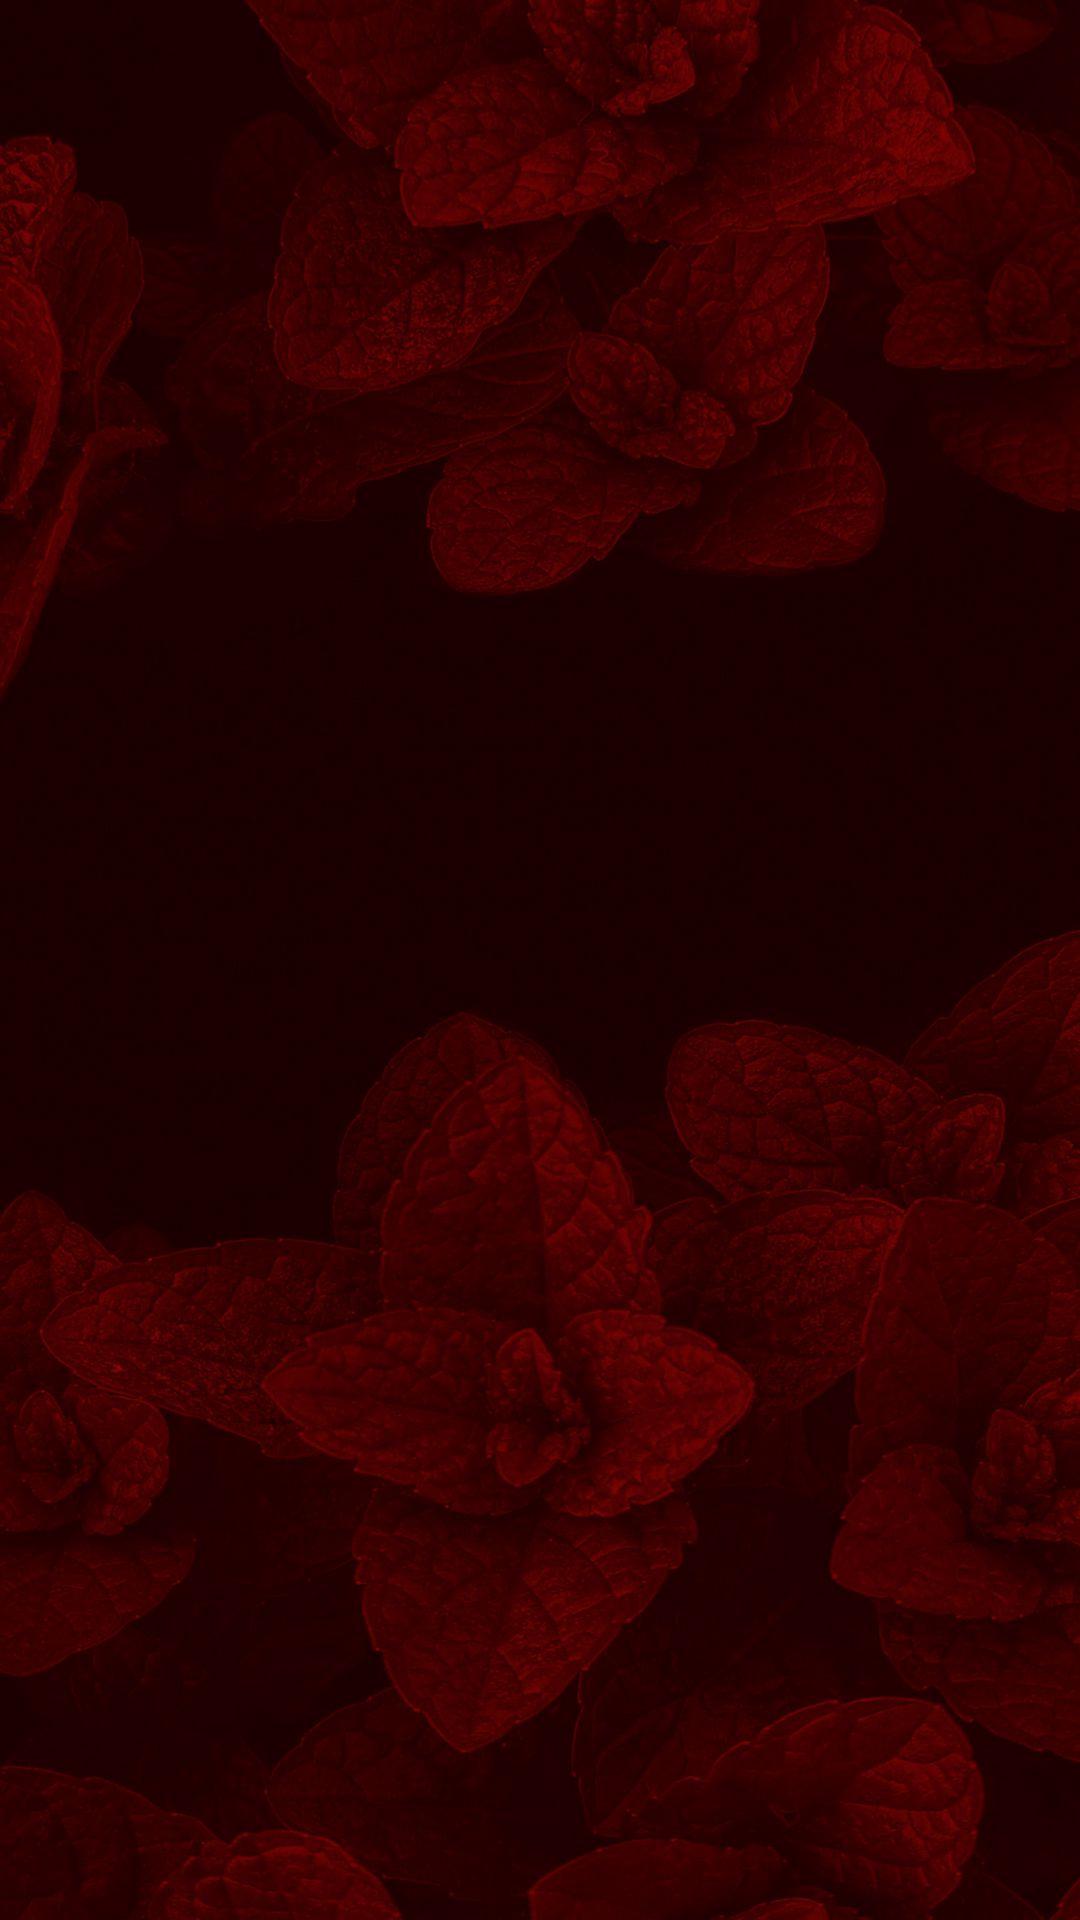 1080x1920 Wallpaper mint, leaves, plant, macro, red, dark